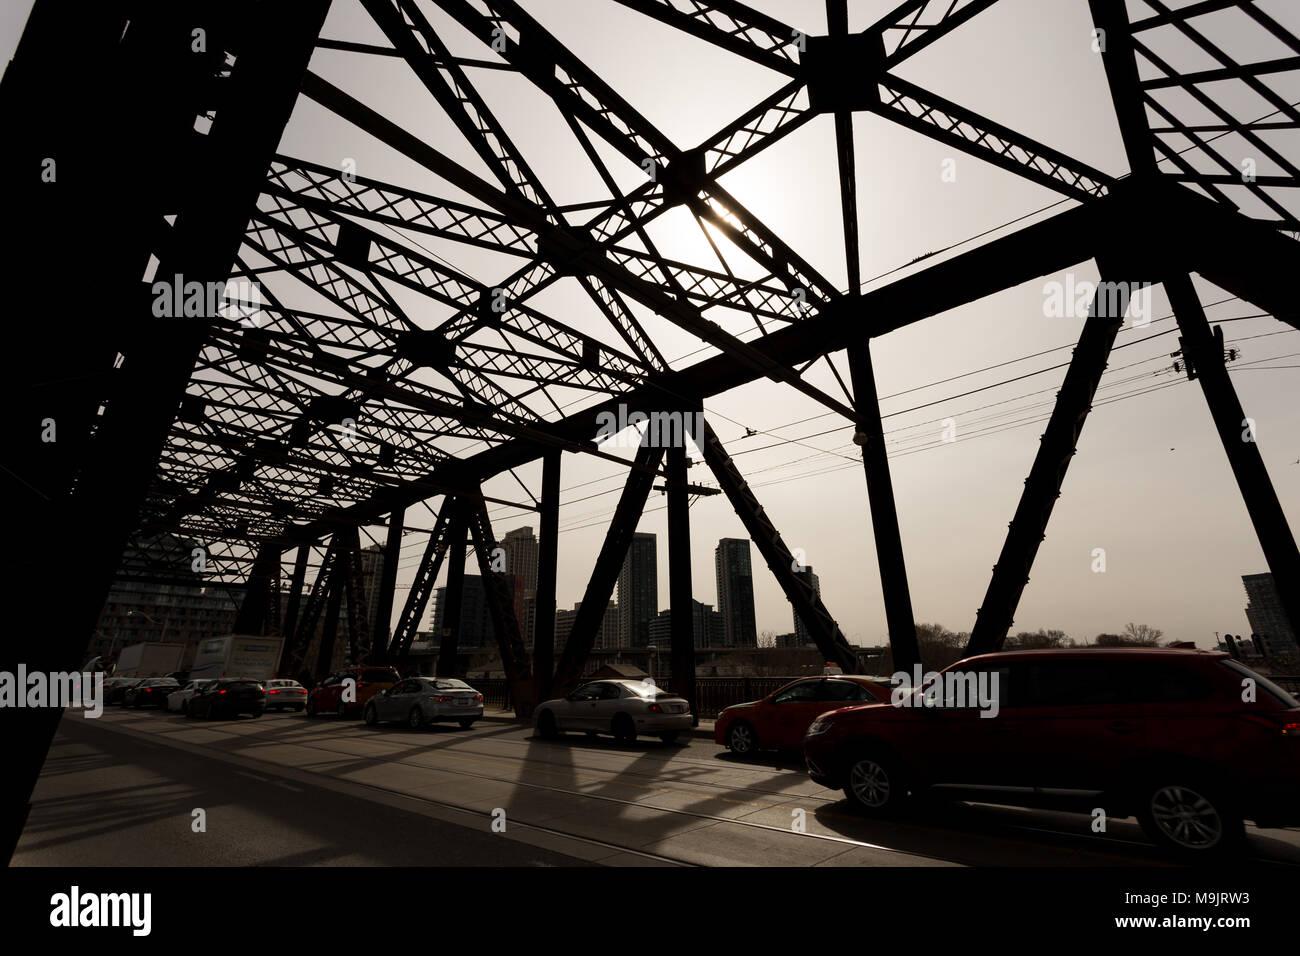 Bridge Grid in High Contrast - Stock Image